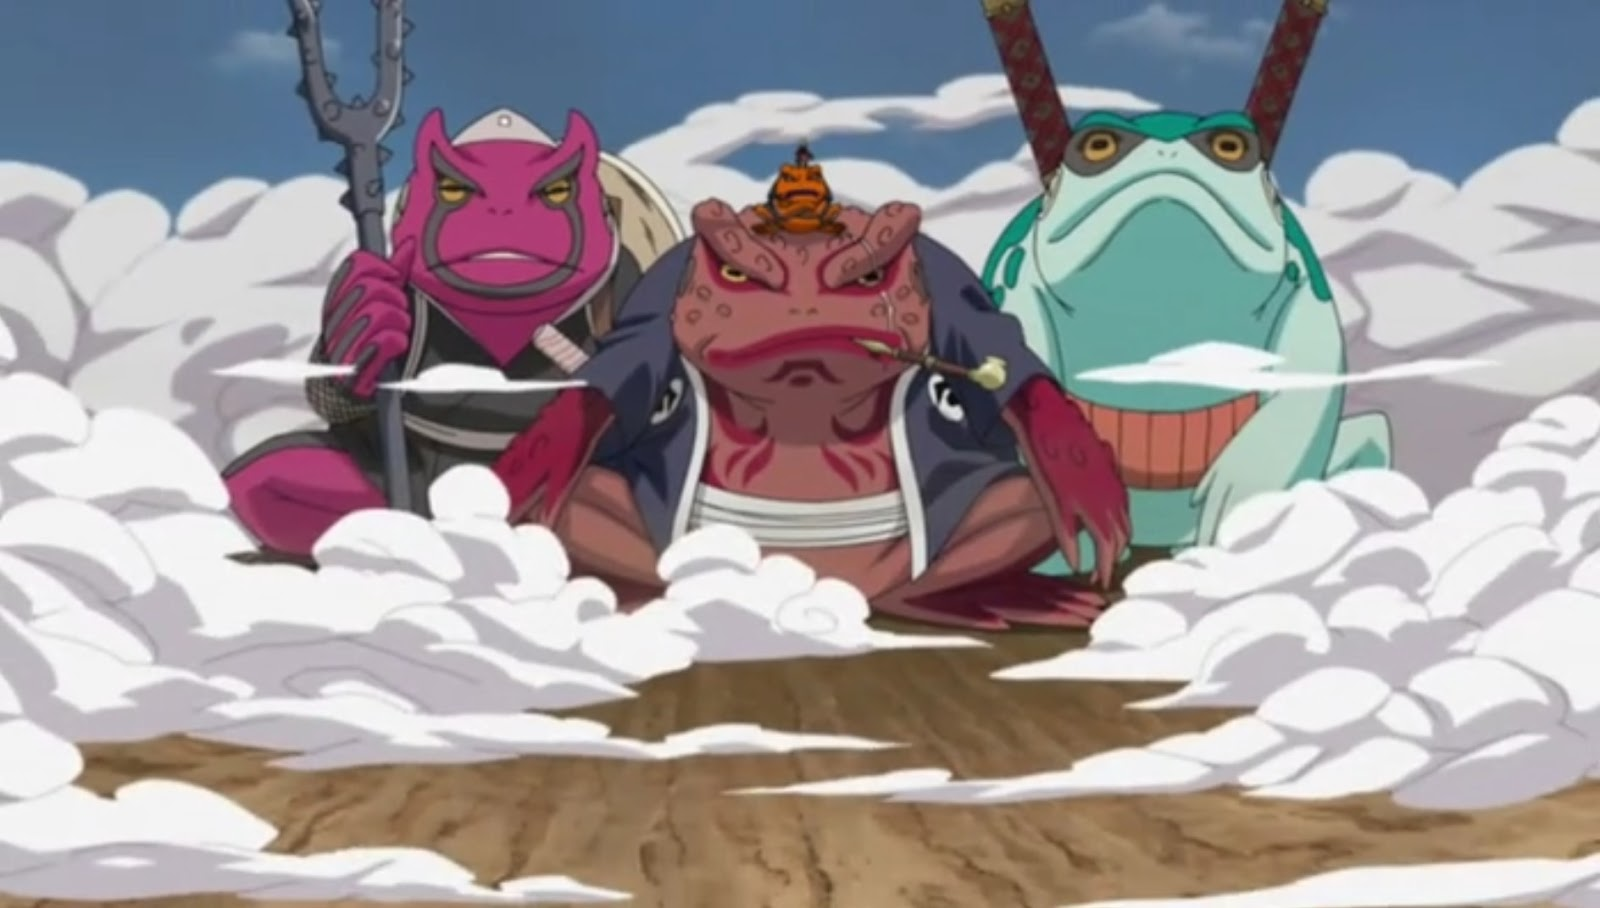 Naruto Shippuden: Episódio 163 – Explosão! Modo Sábio